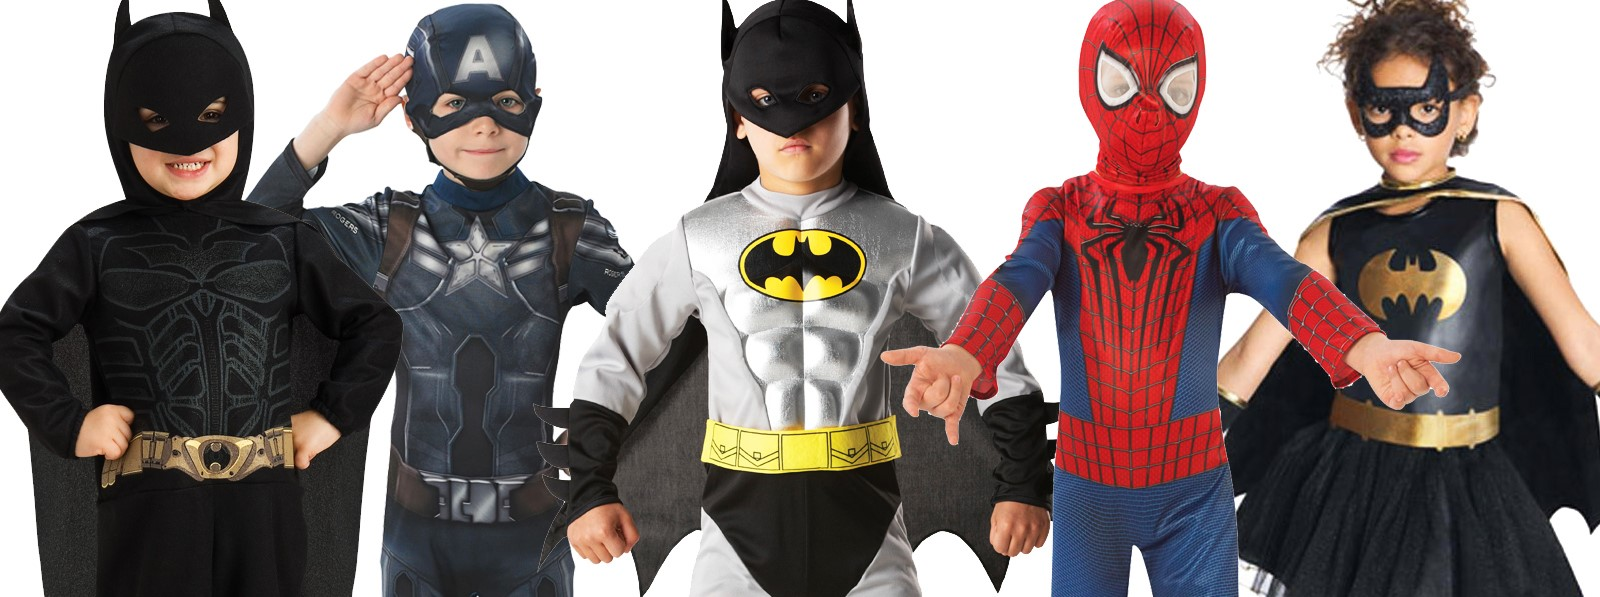 5 Popular Halloween Costumes For Boys